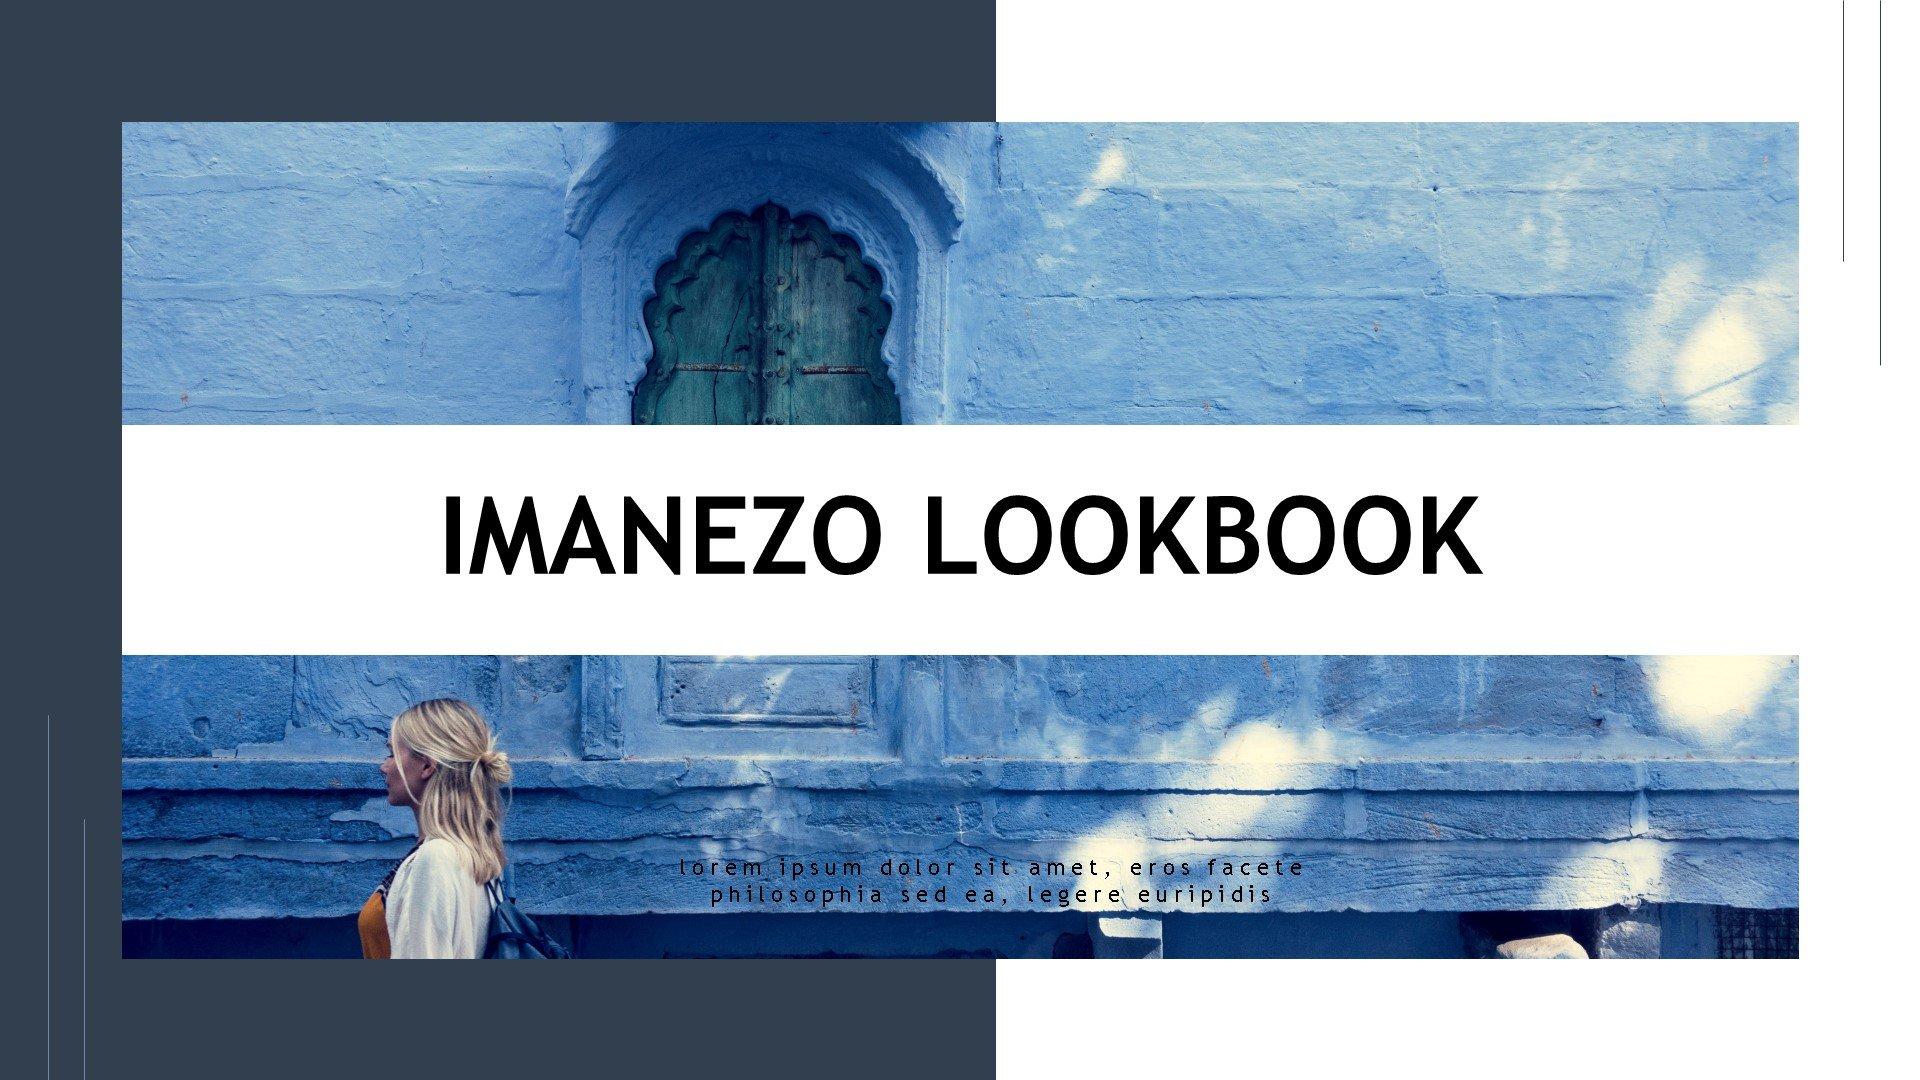 Imanezo - Lookbook Presentaion Powerpoint #83911